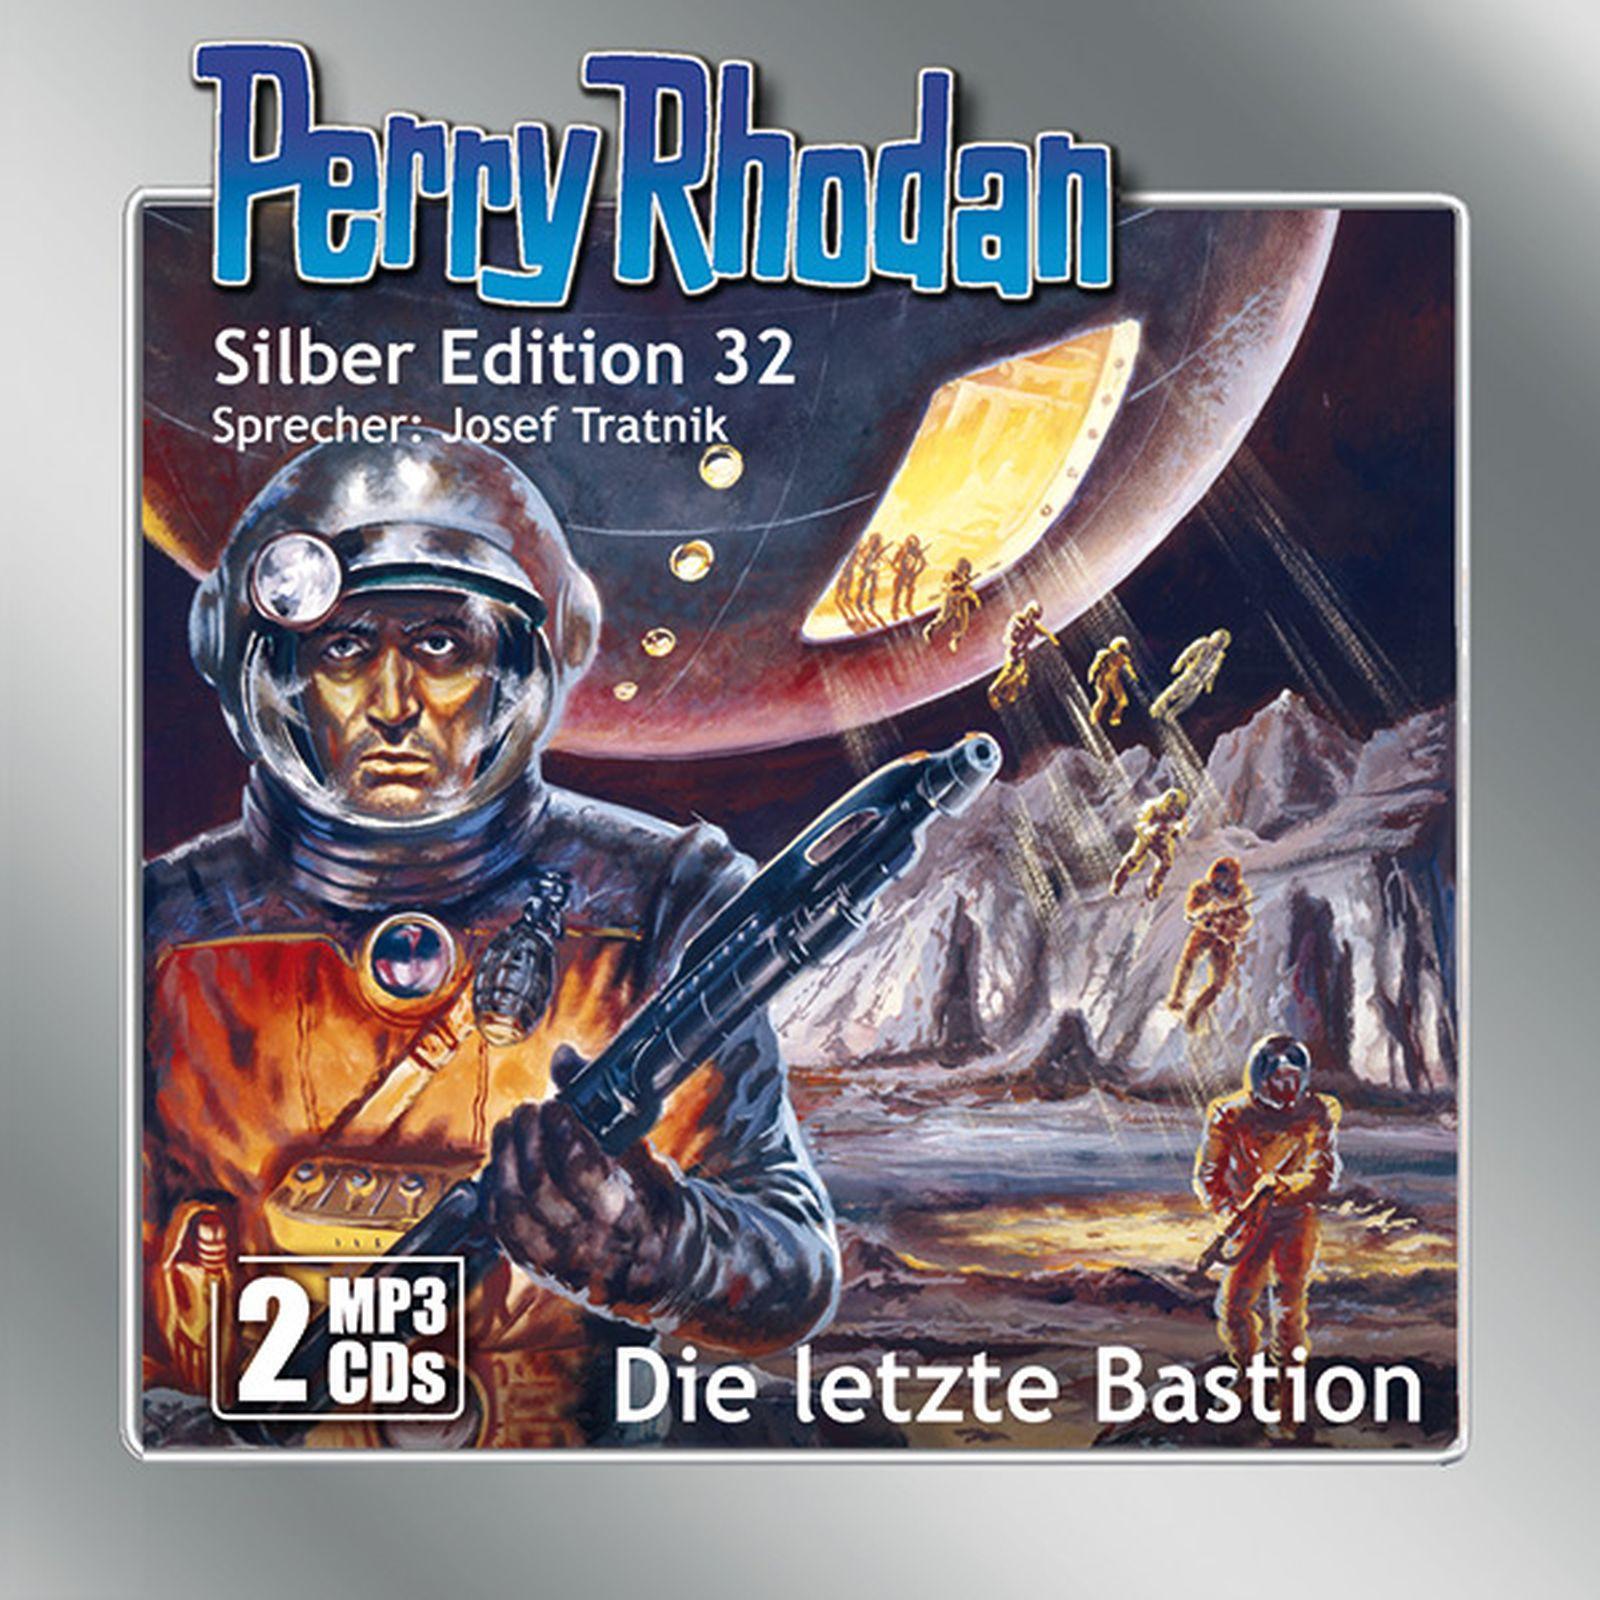 Perry Rhodan Silber Edition 32 Die letzte Bastion (2 MP3-CDs)